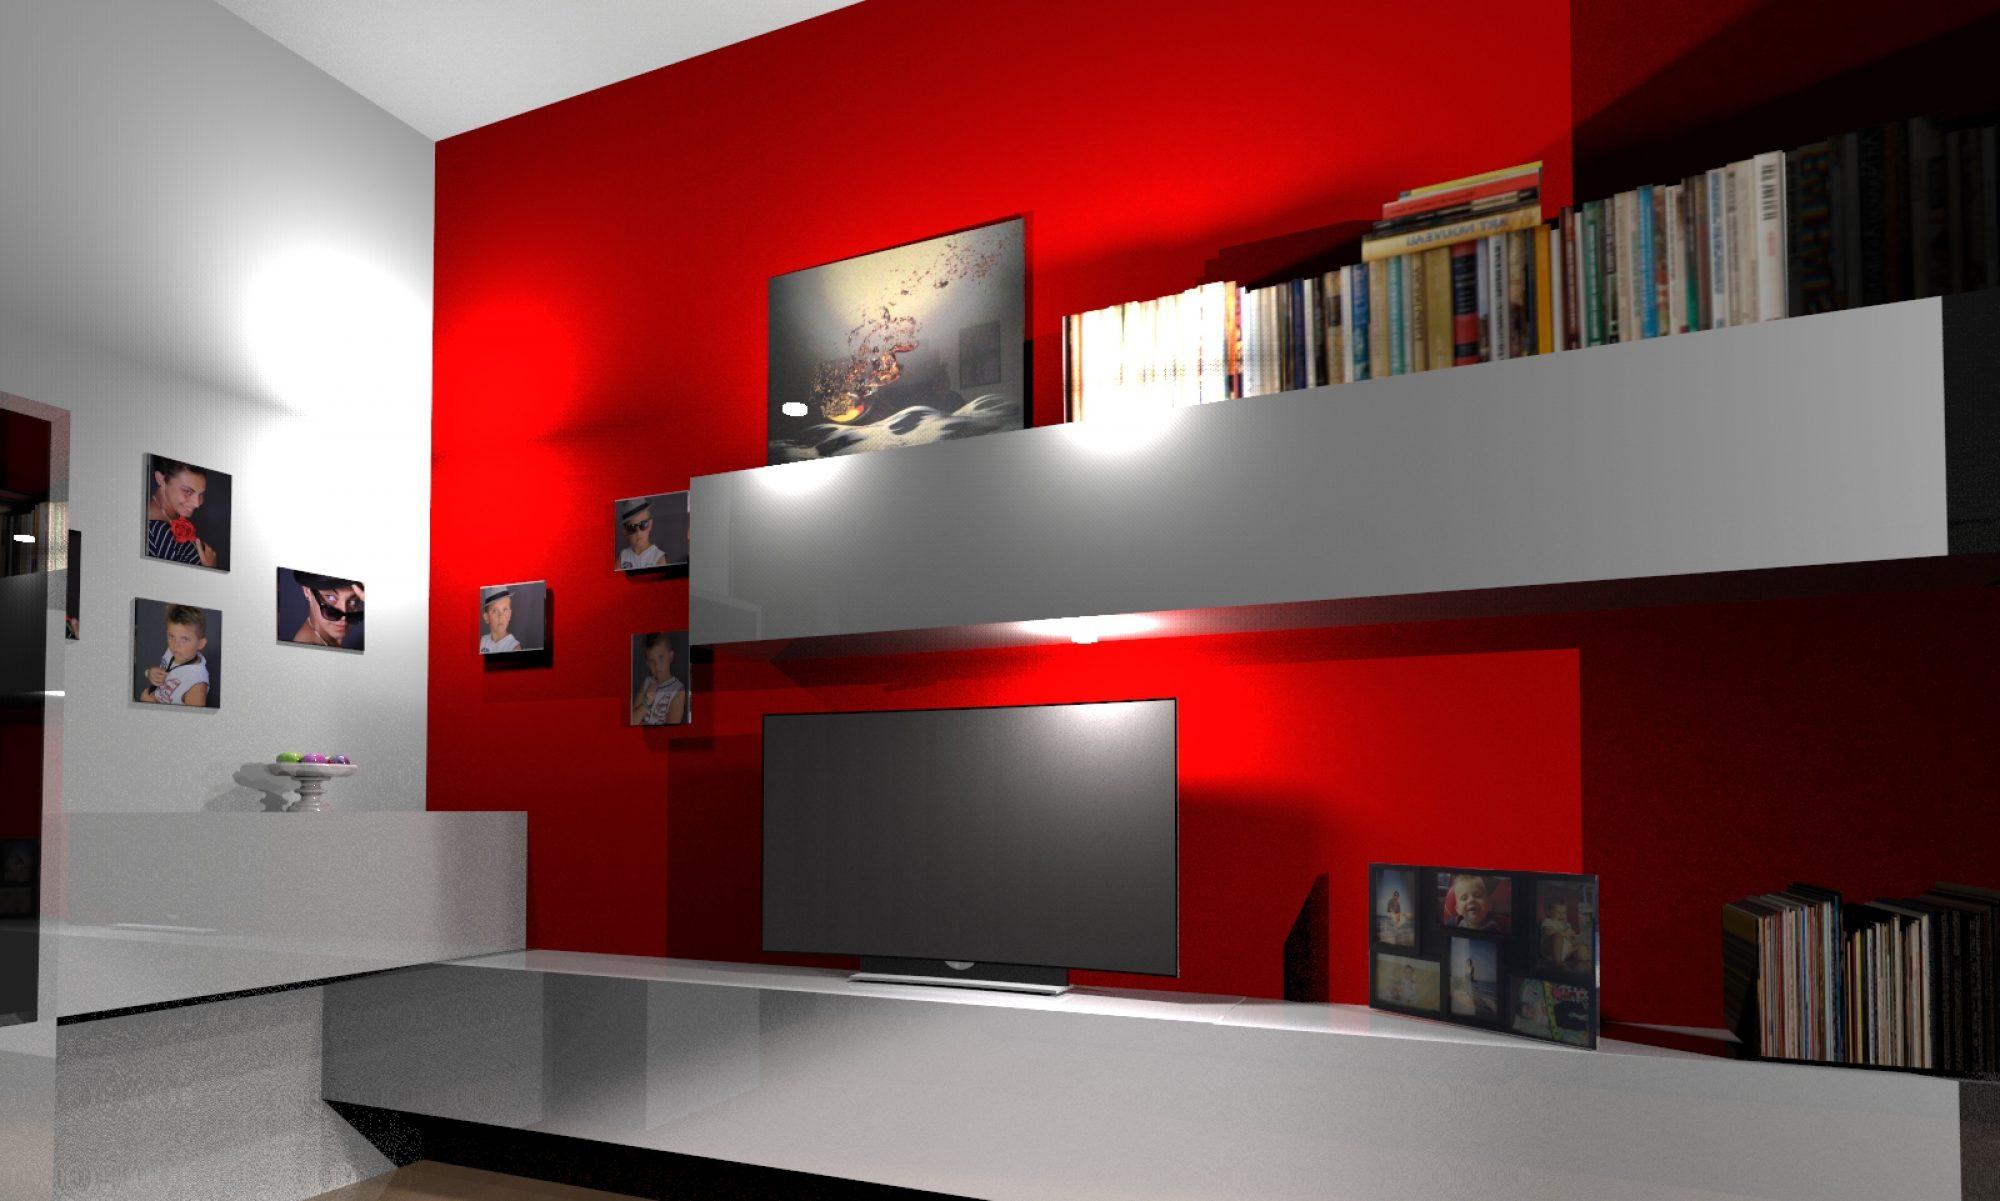 virtual and design